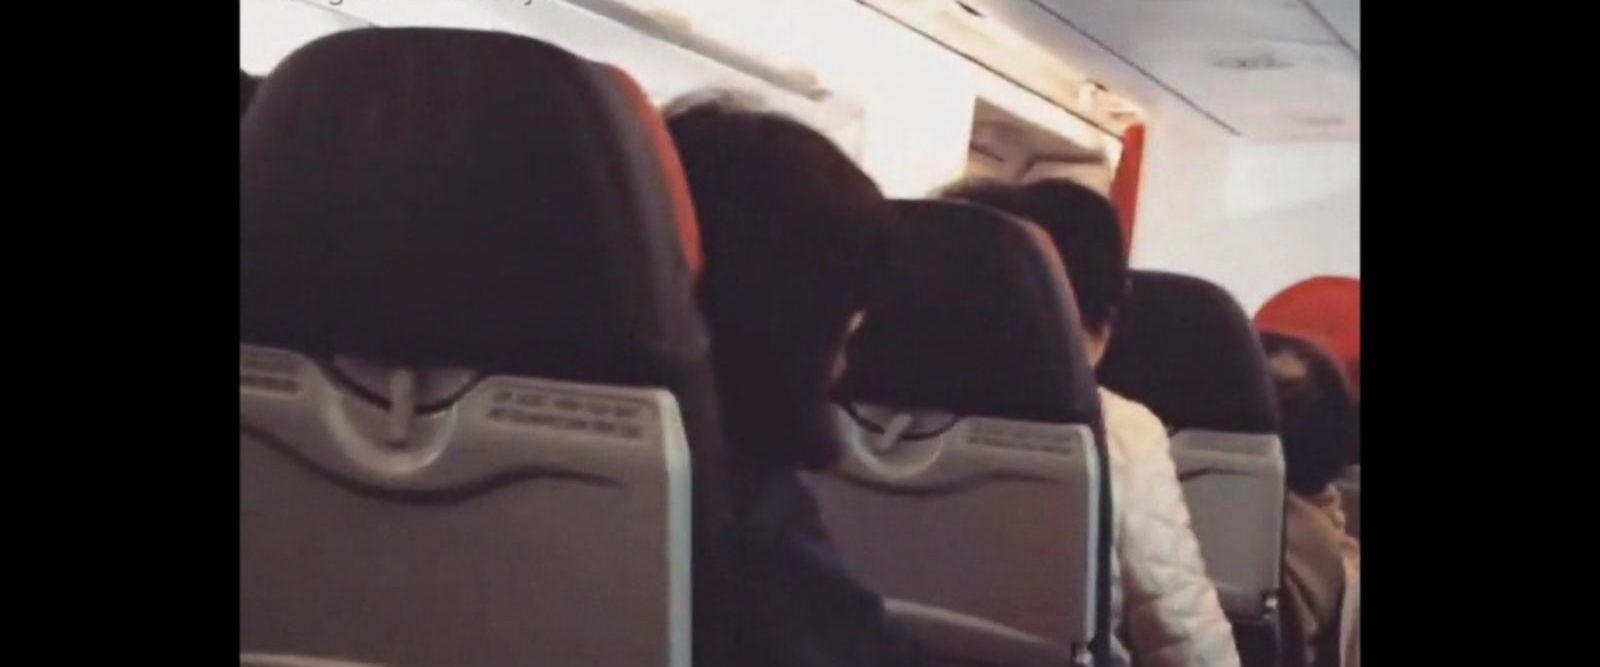 VIDEO: Pilot tells passengers to 'say a prayer' during flight emergency